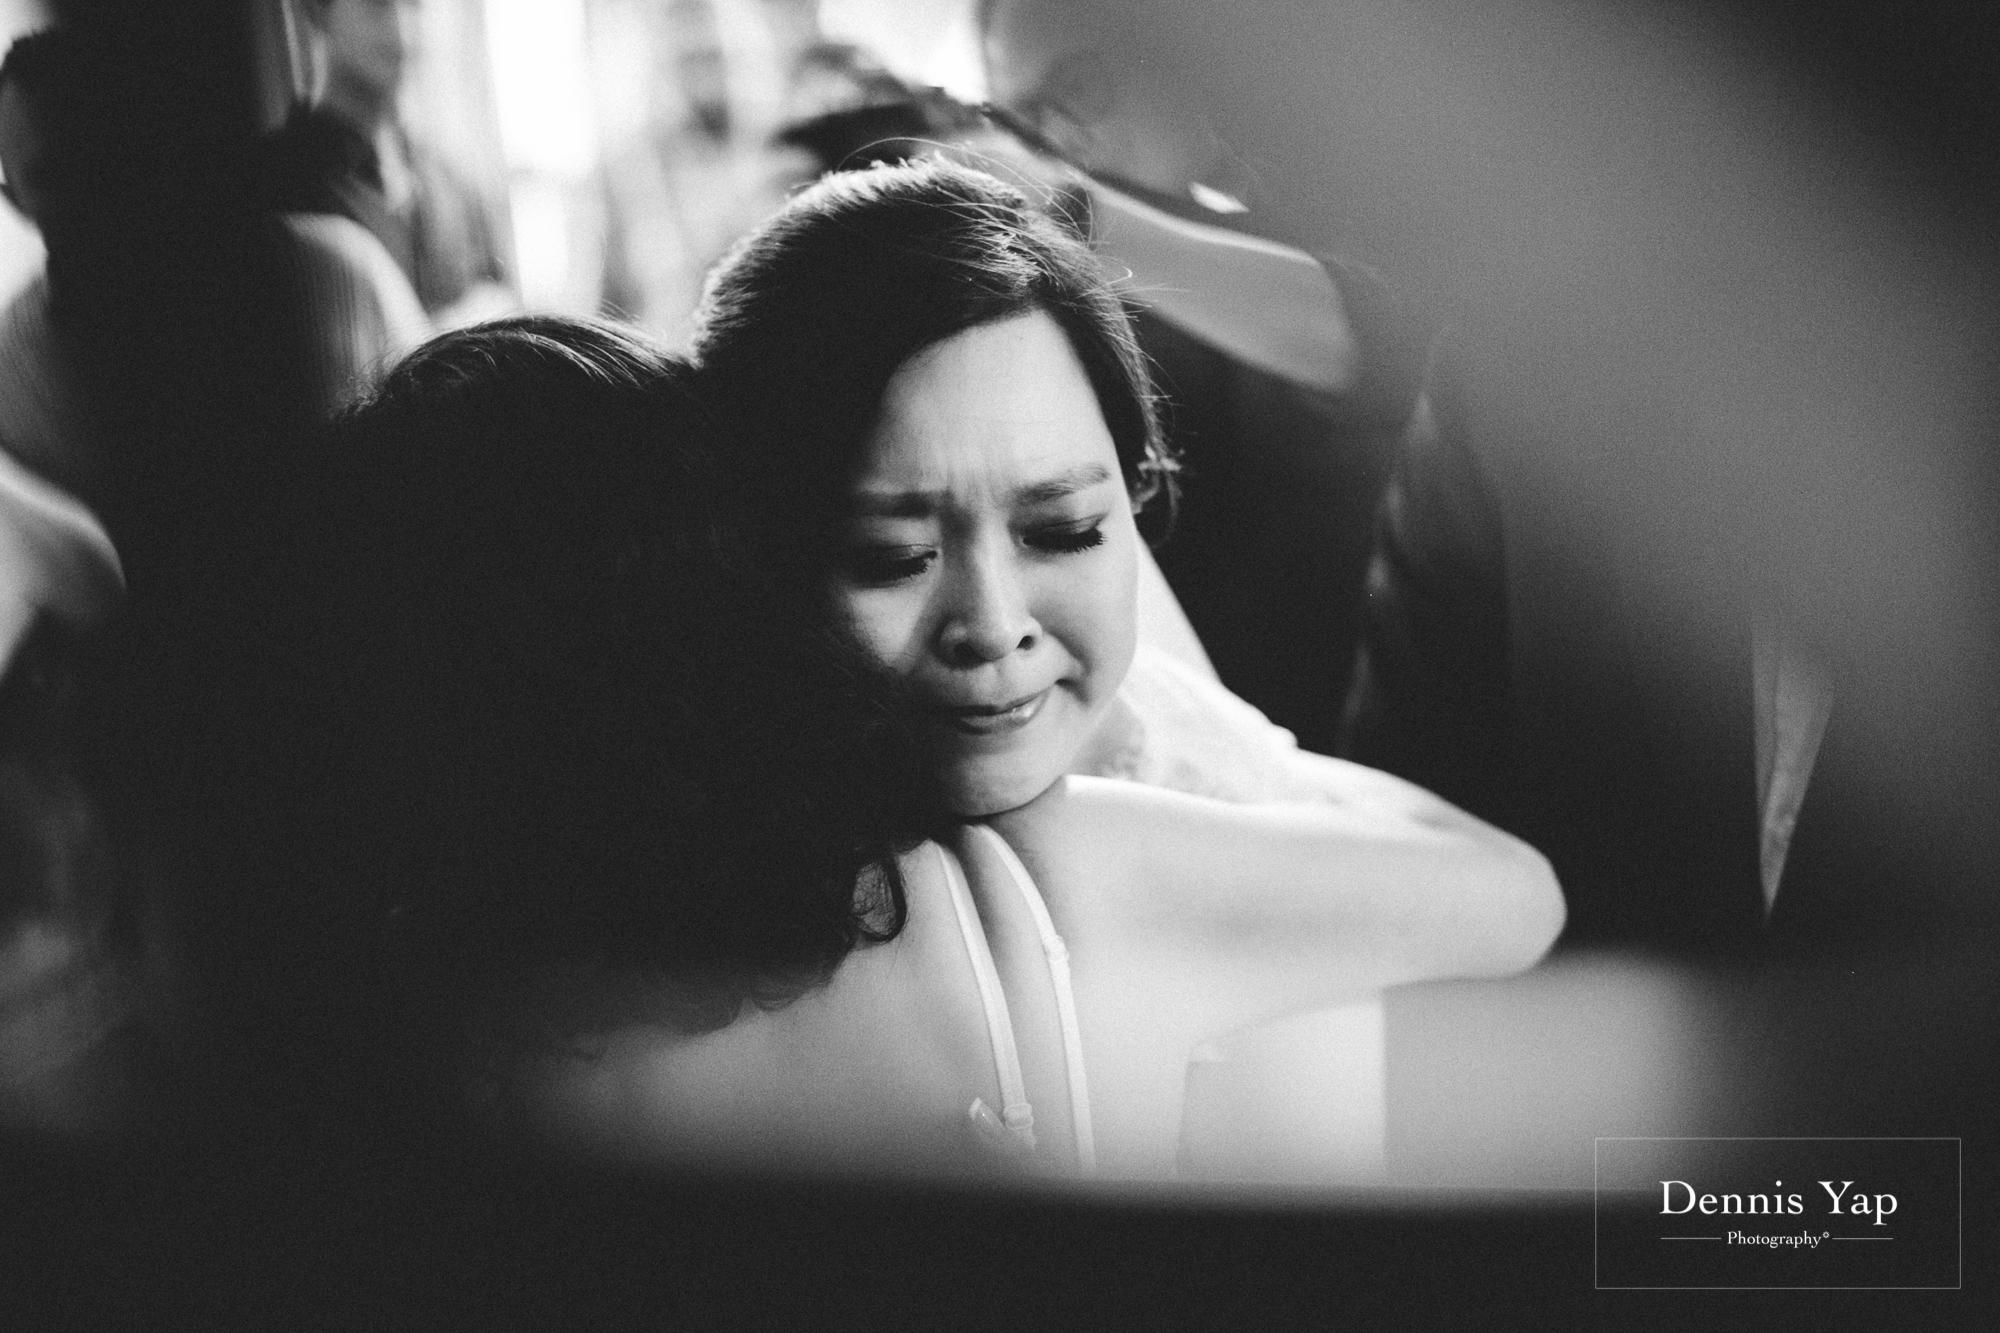 ino sheri black white church wedding st thomas more subang jaya dennis yap photography touching love beloved australia indonesia-18.jpg